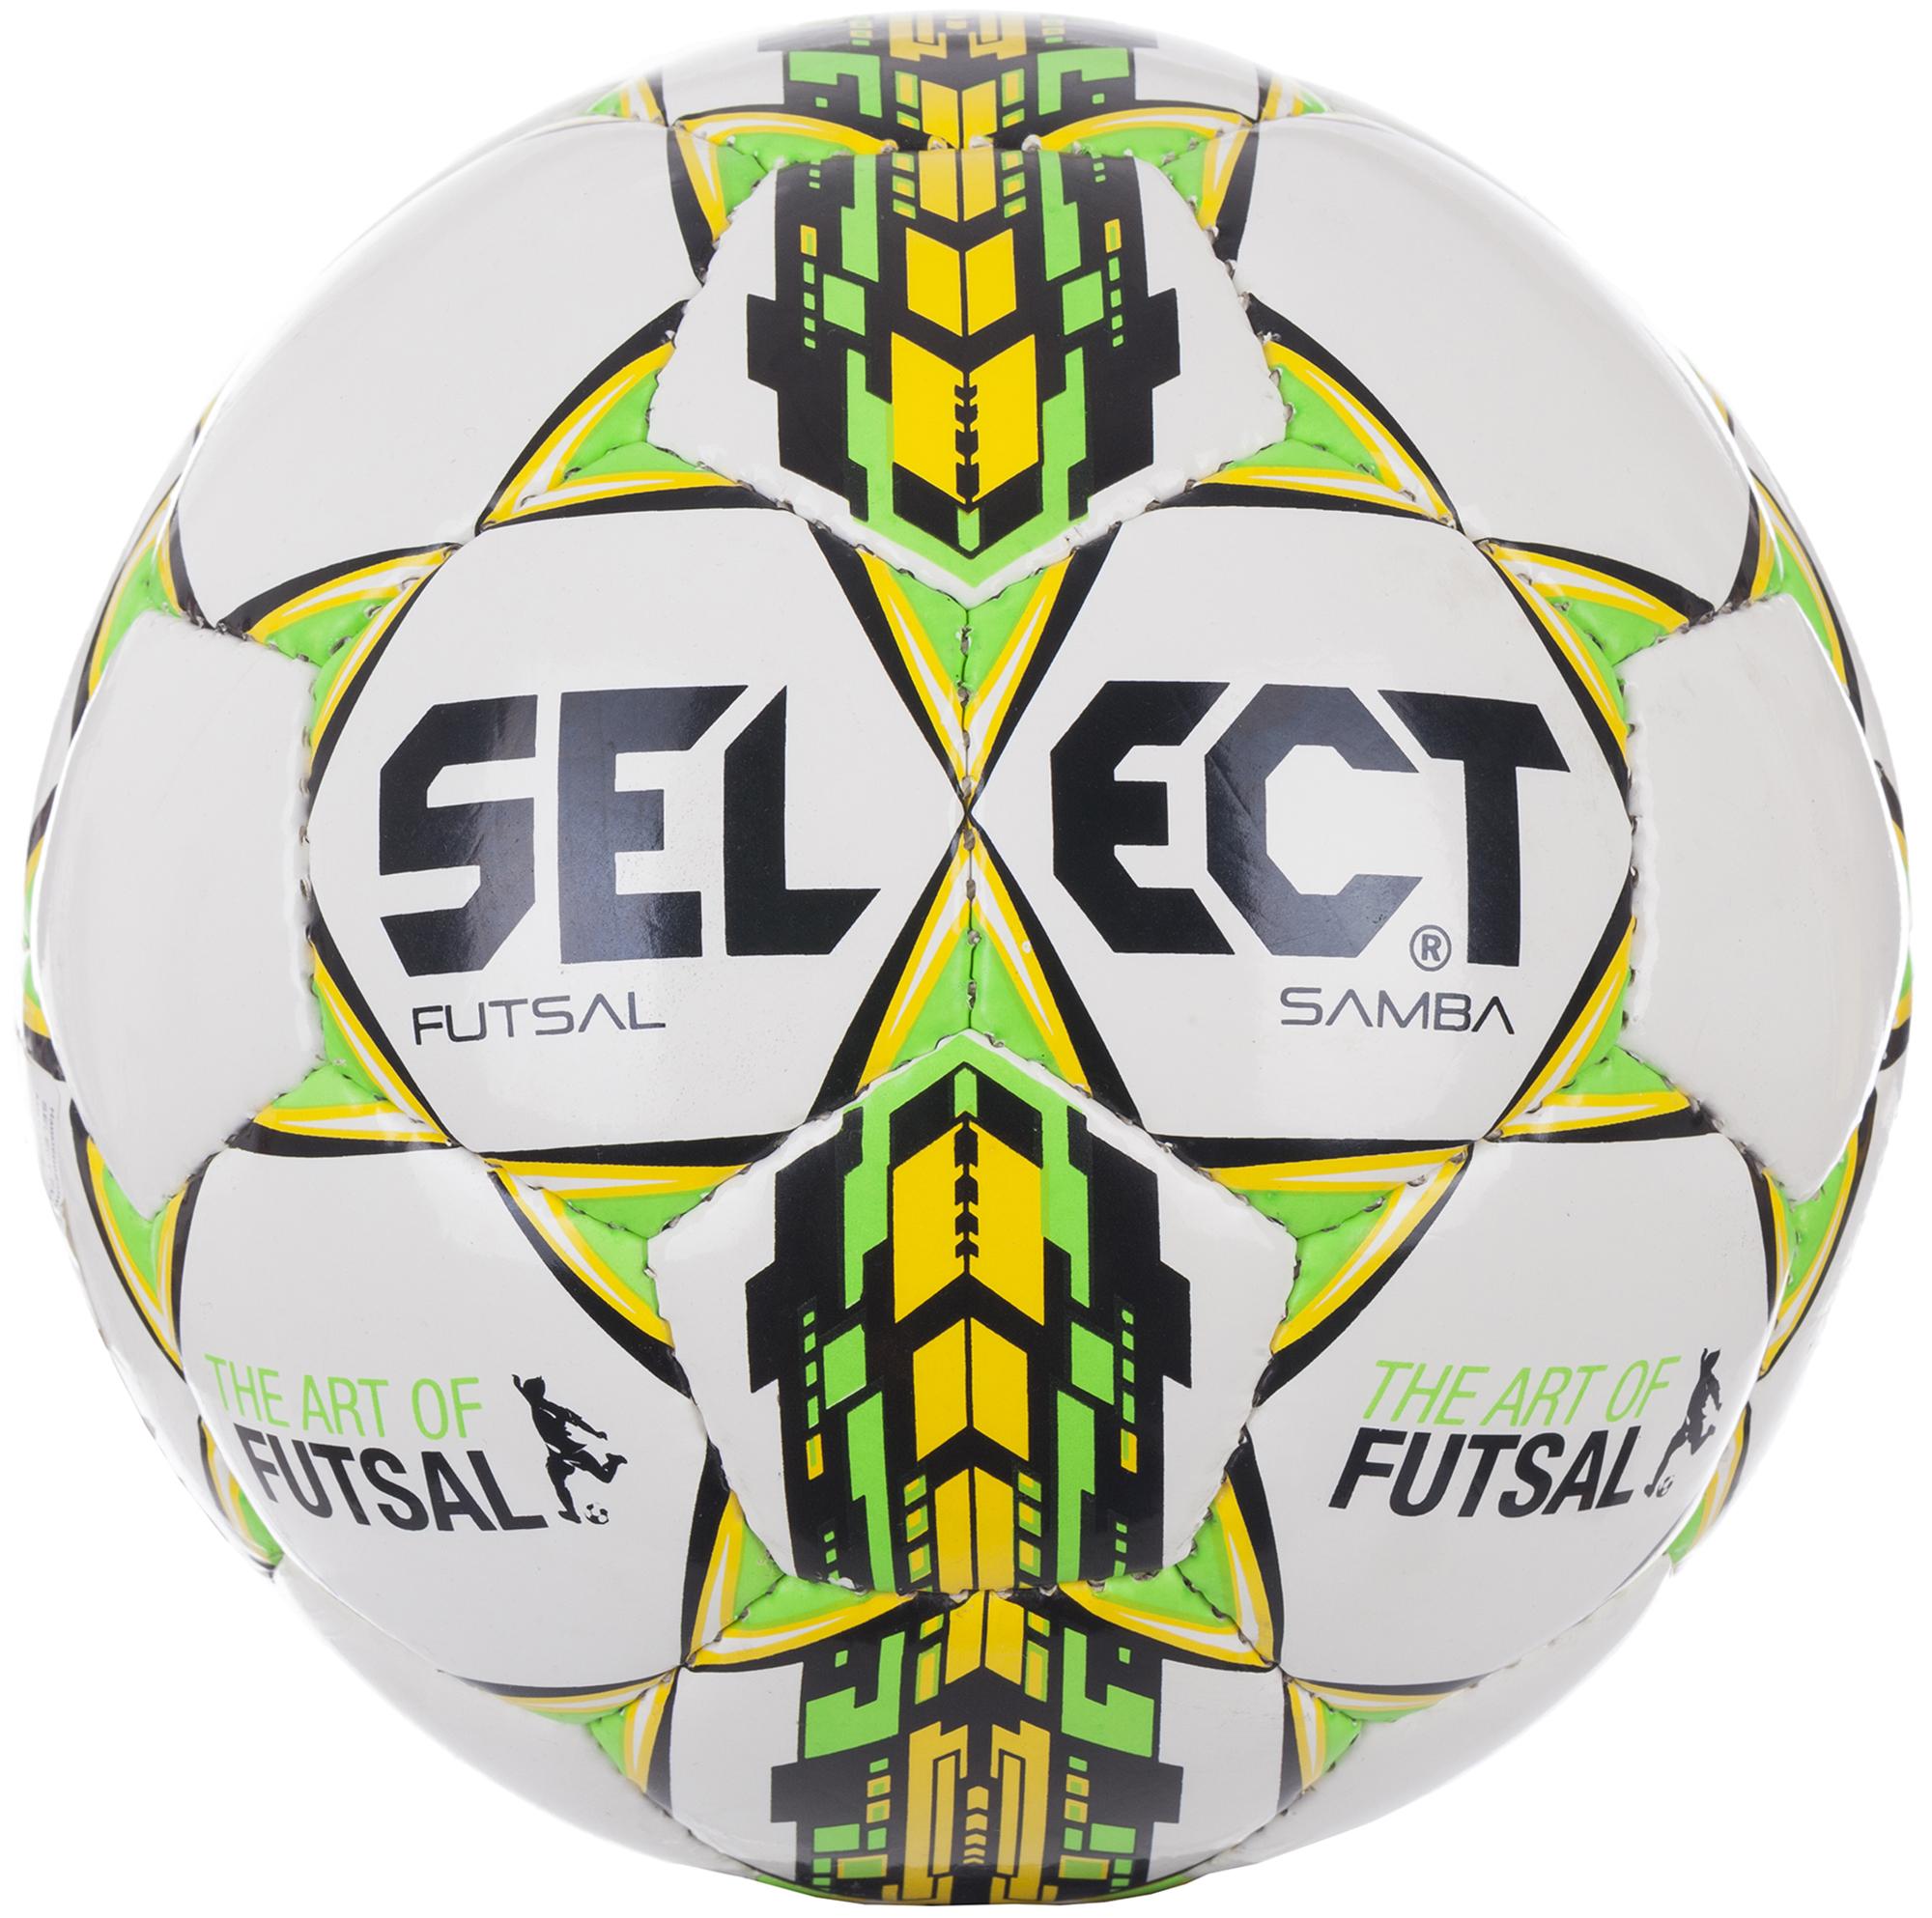 Select Мяч футбольный Select Futsal Samba